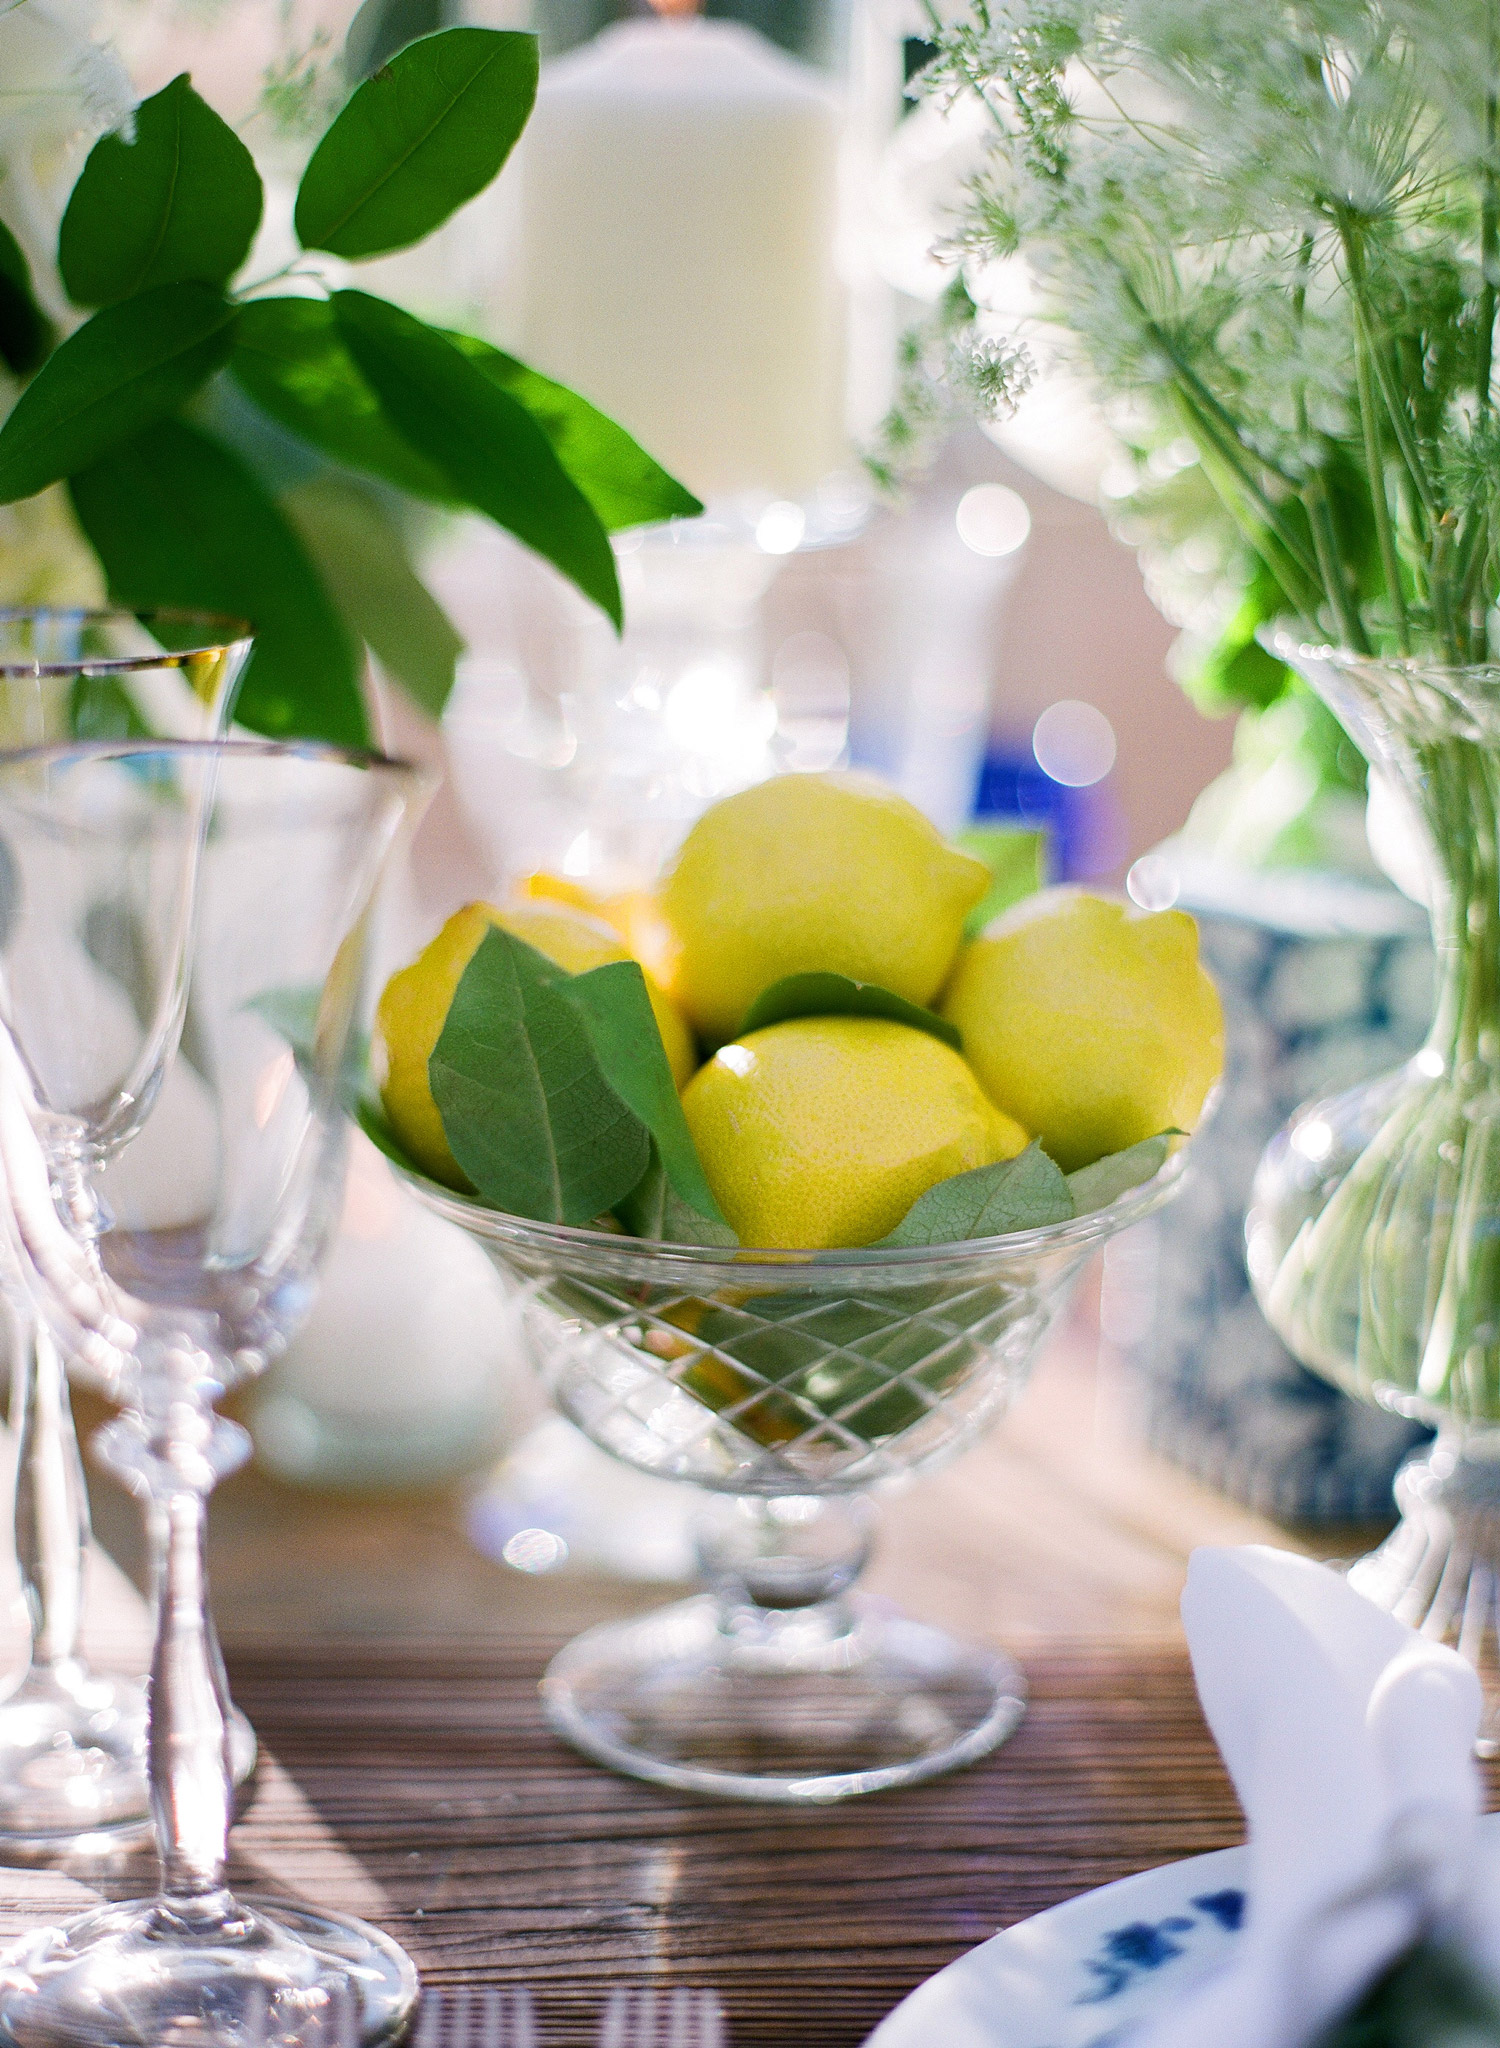 glass bowl of lemons reception table